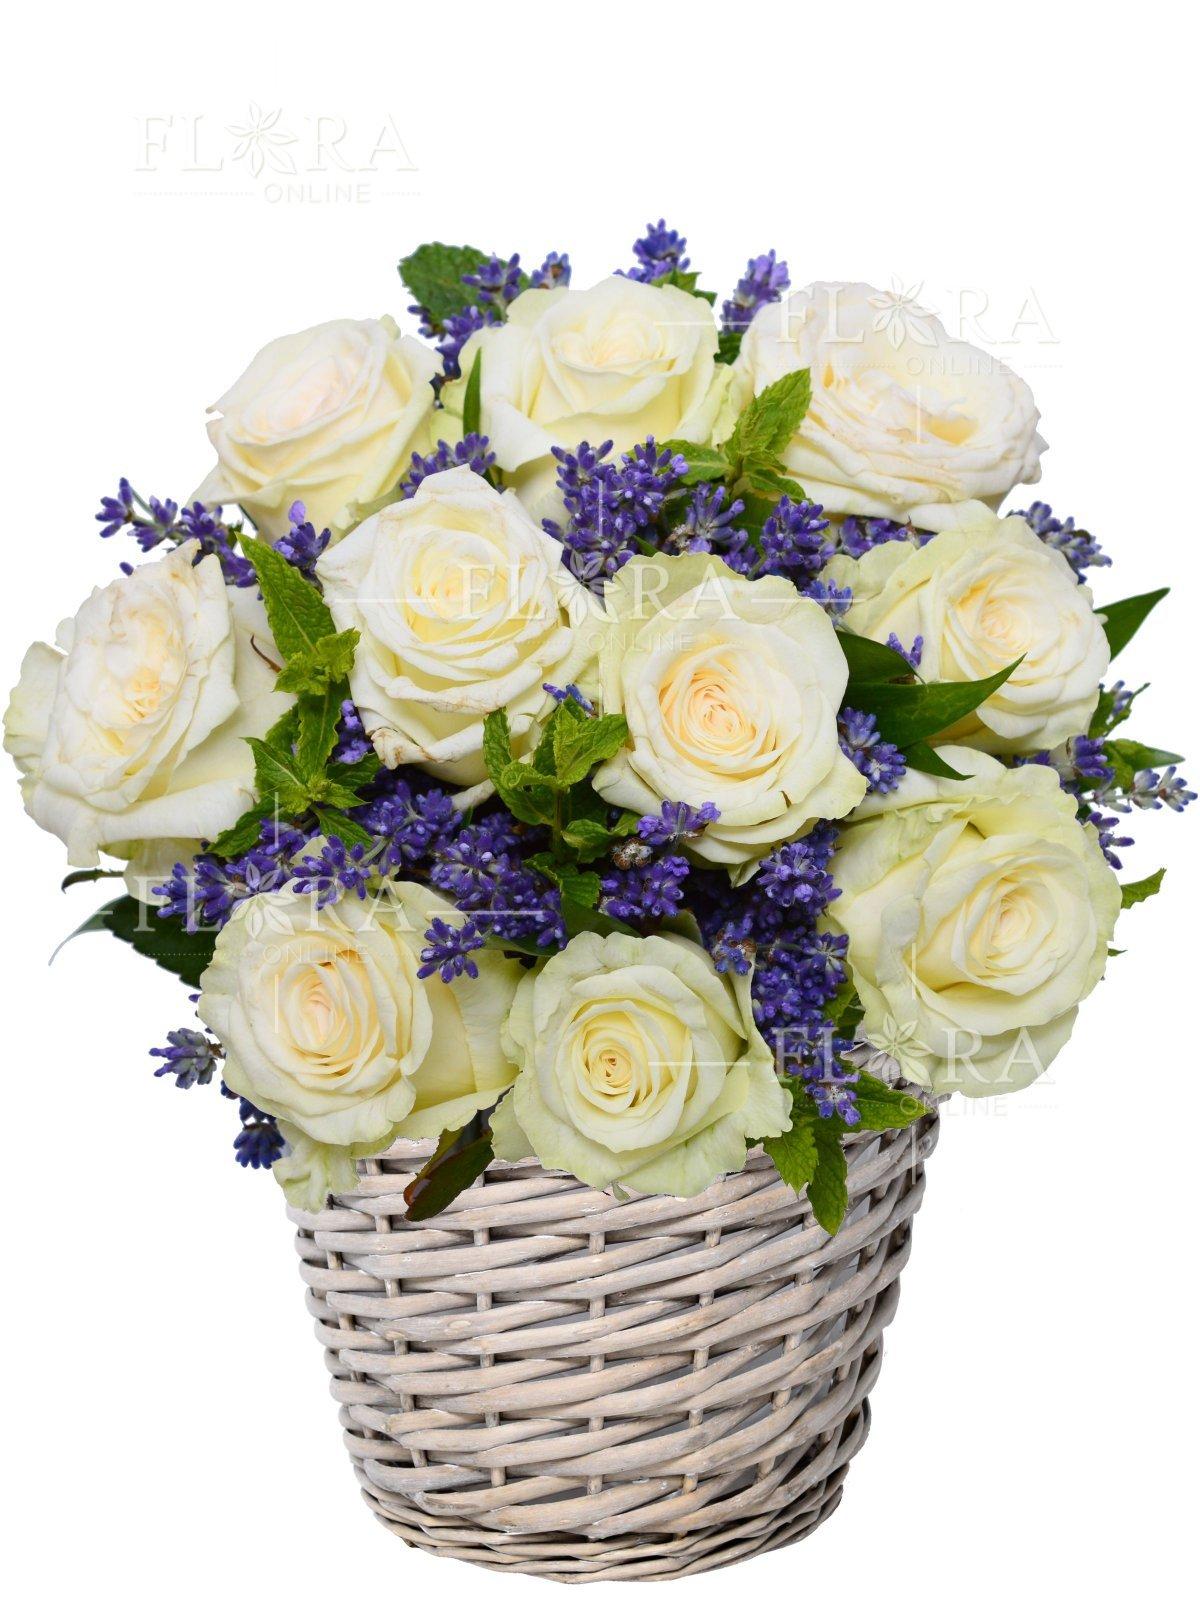 Flower basket chanel roses flora online discount 388 on your next purchase beautiful flower basket izmirmasajfo